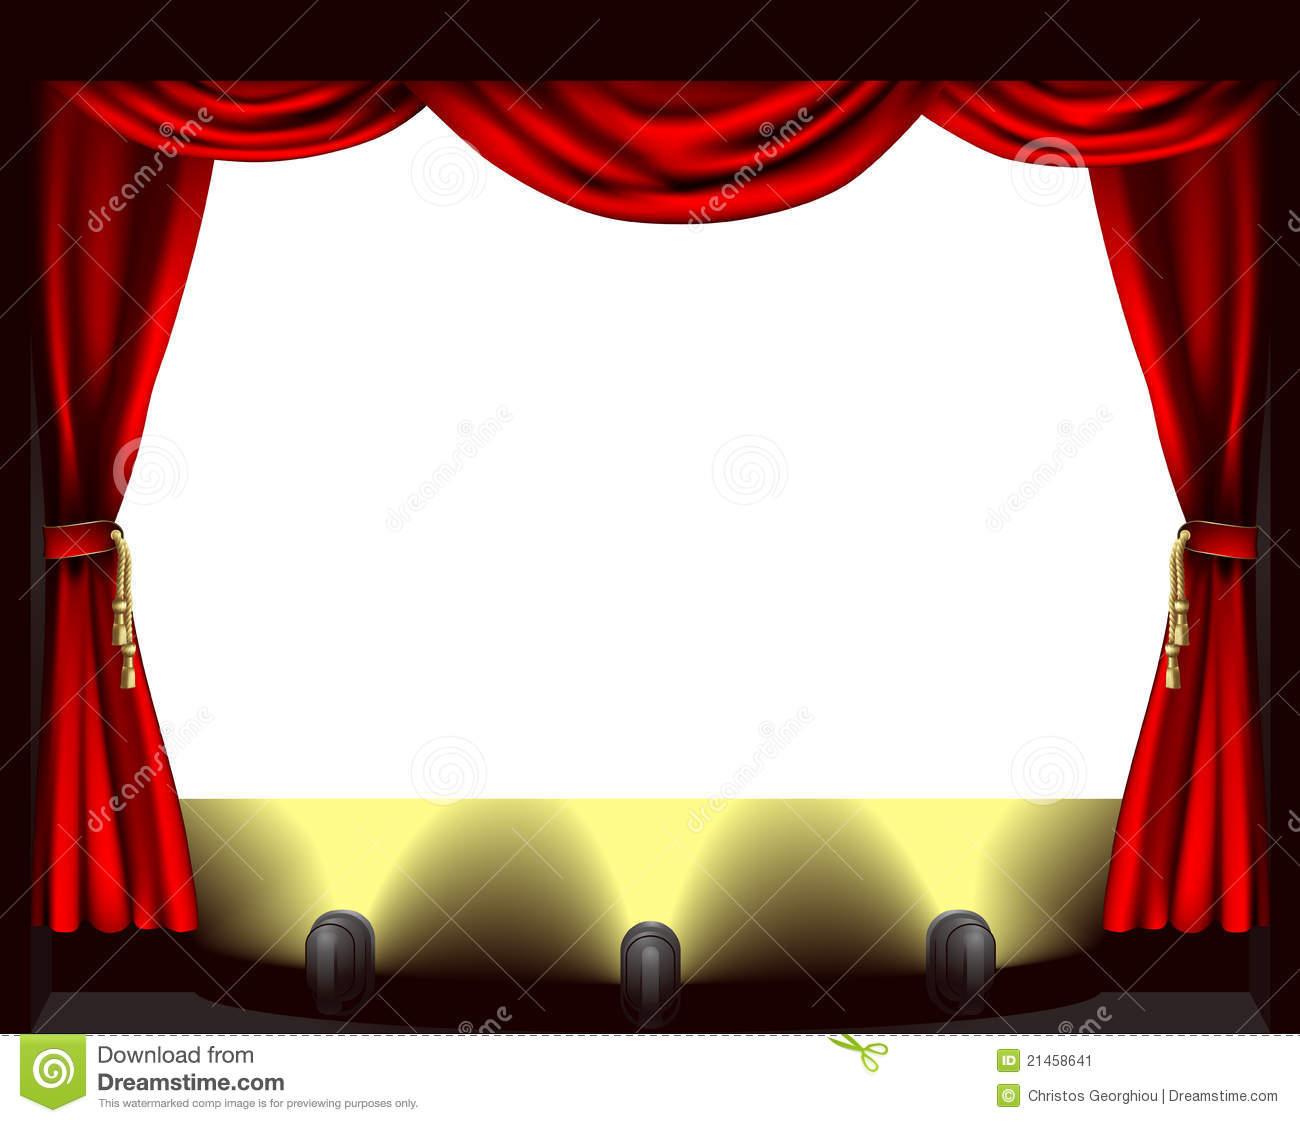 stage footlights images.